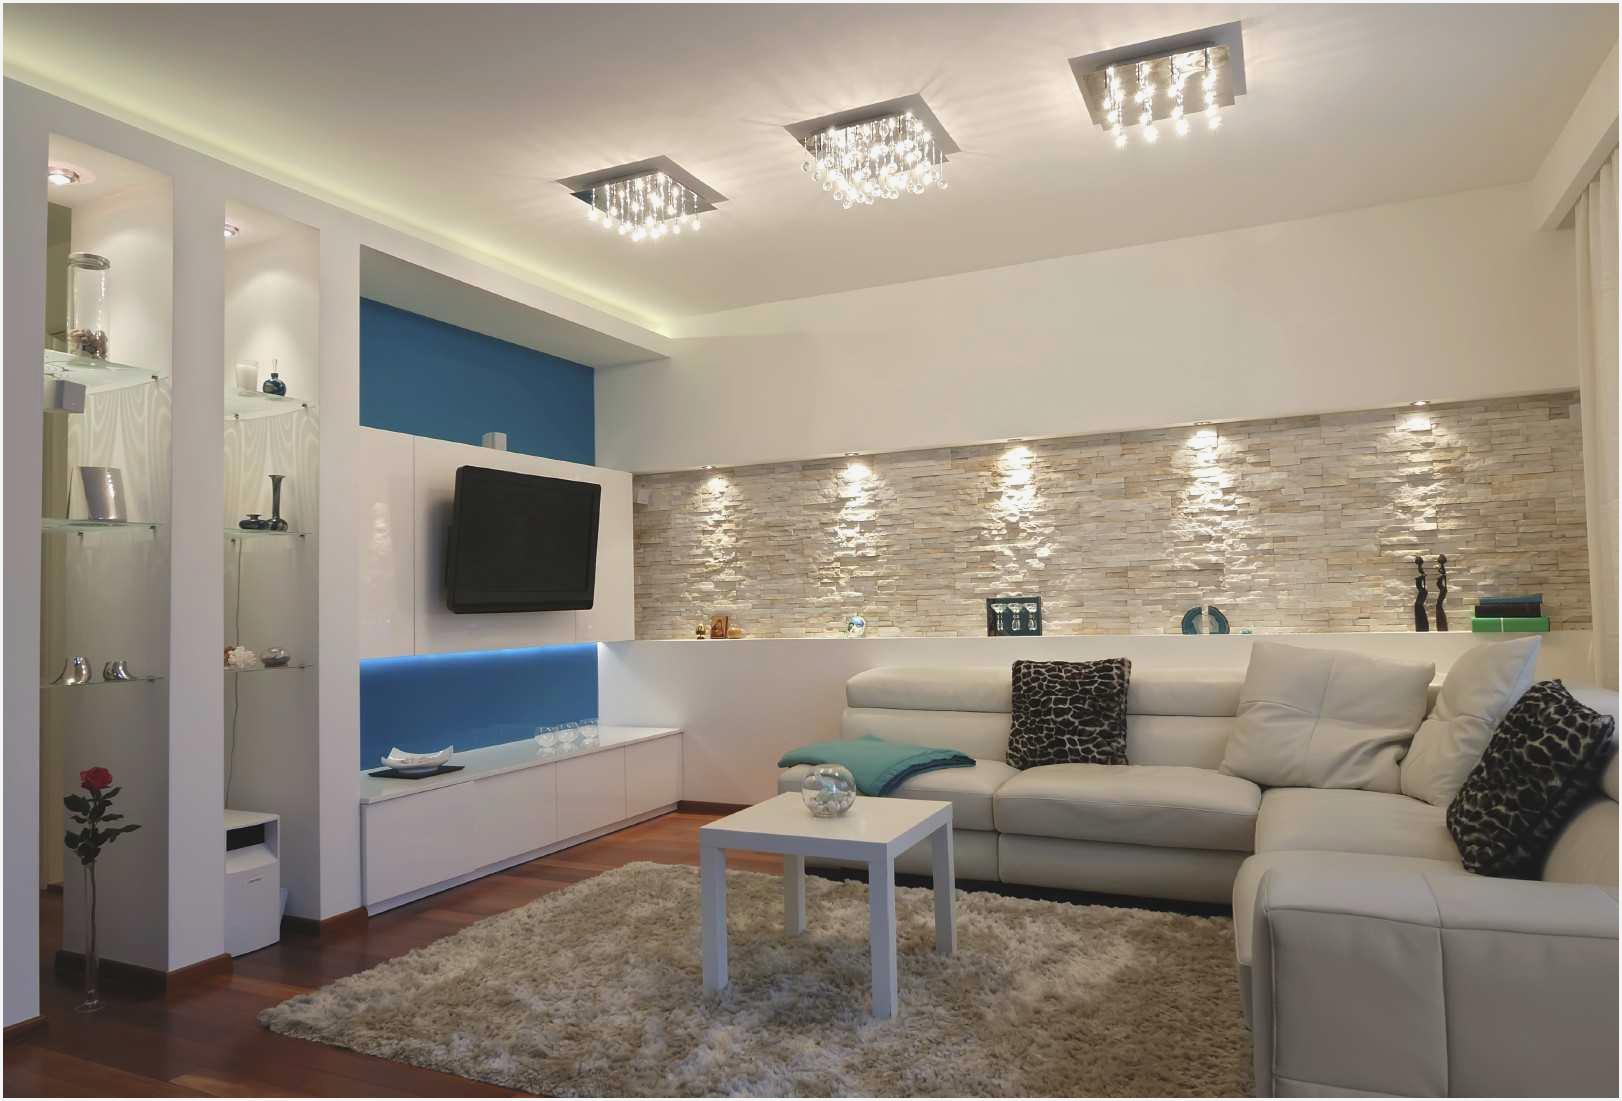 Full Size of Wohnzimmer Indirekte Beleuchtung Boden Decke Selber Bauen Wand Anleitung Machen Stehleuchte Stehlampen Wandbilder Led Lampen Deckenleuchte Teppich Wohnzimmer Wohnzimmer Indirekte Beleuchtung